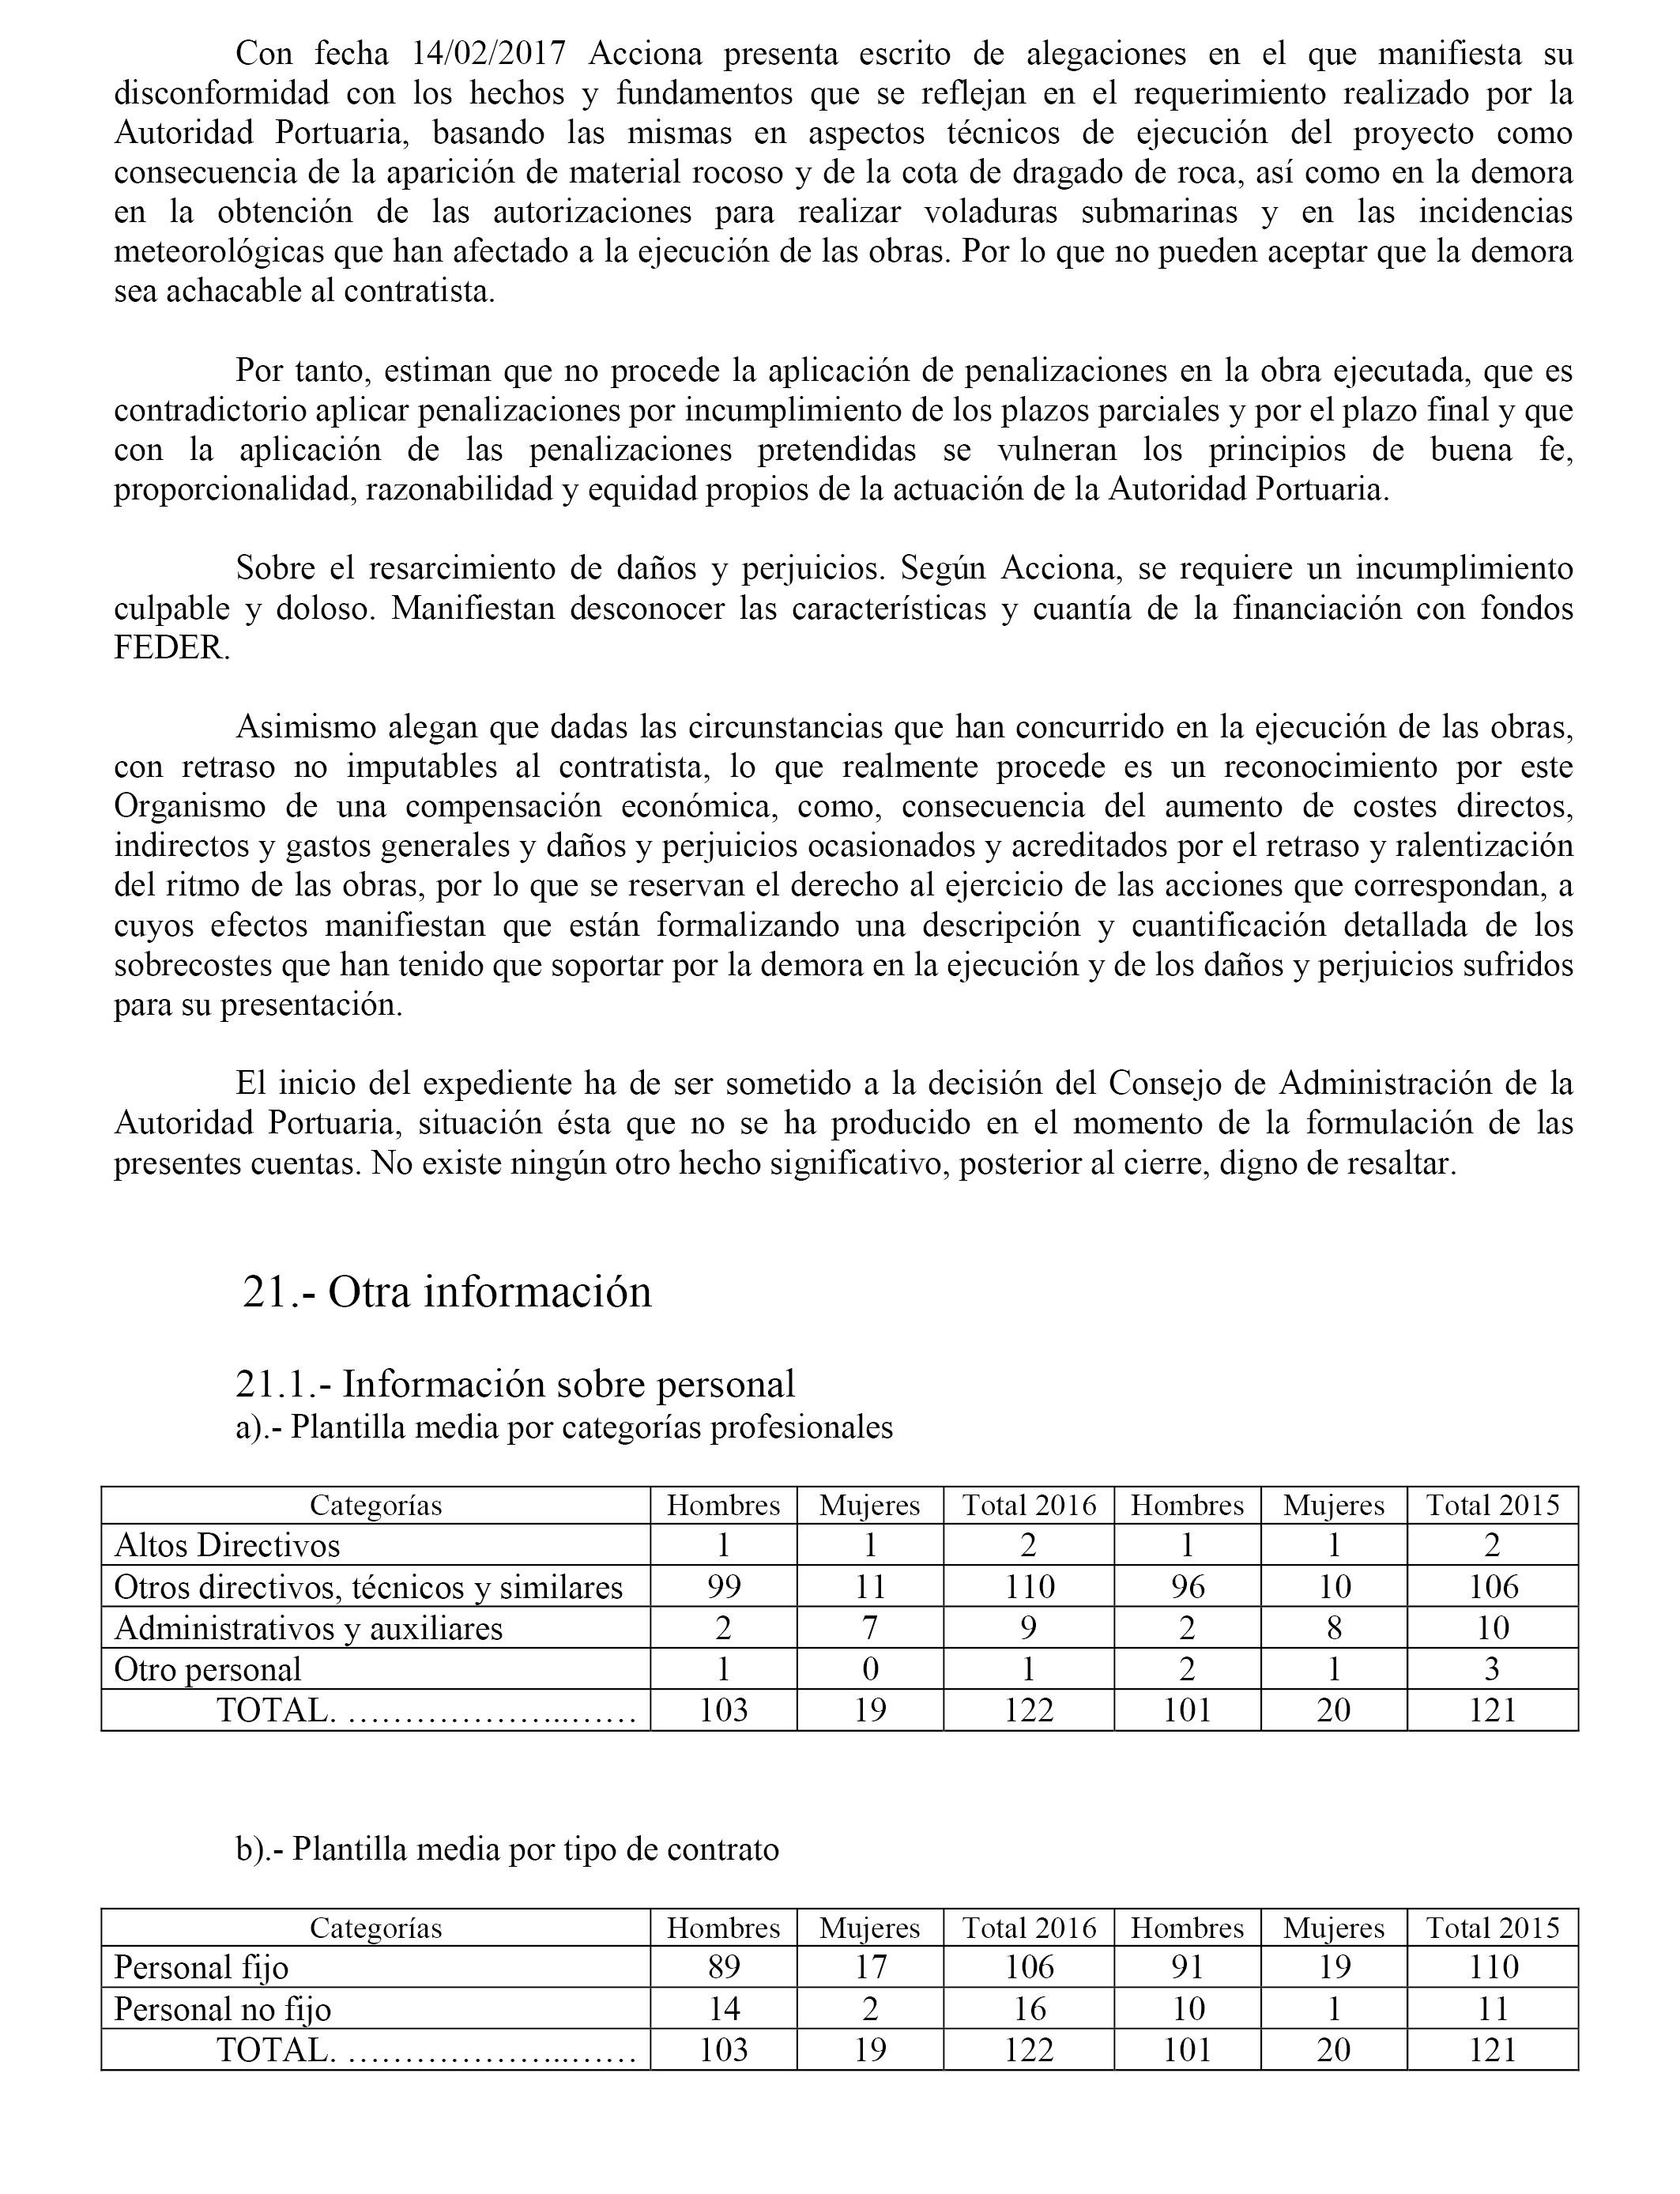 BOE.es - Documento BOE-A-2017-8274